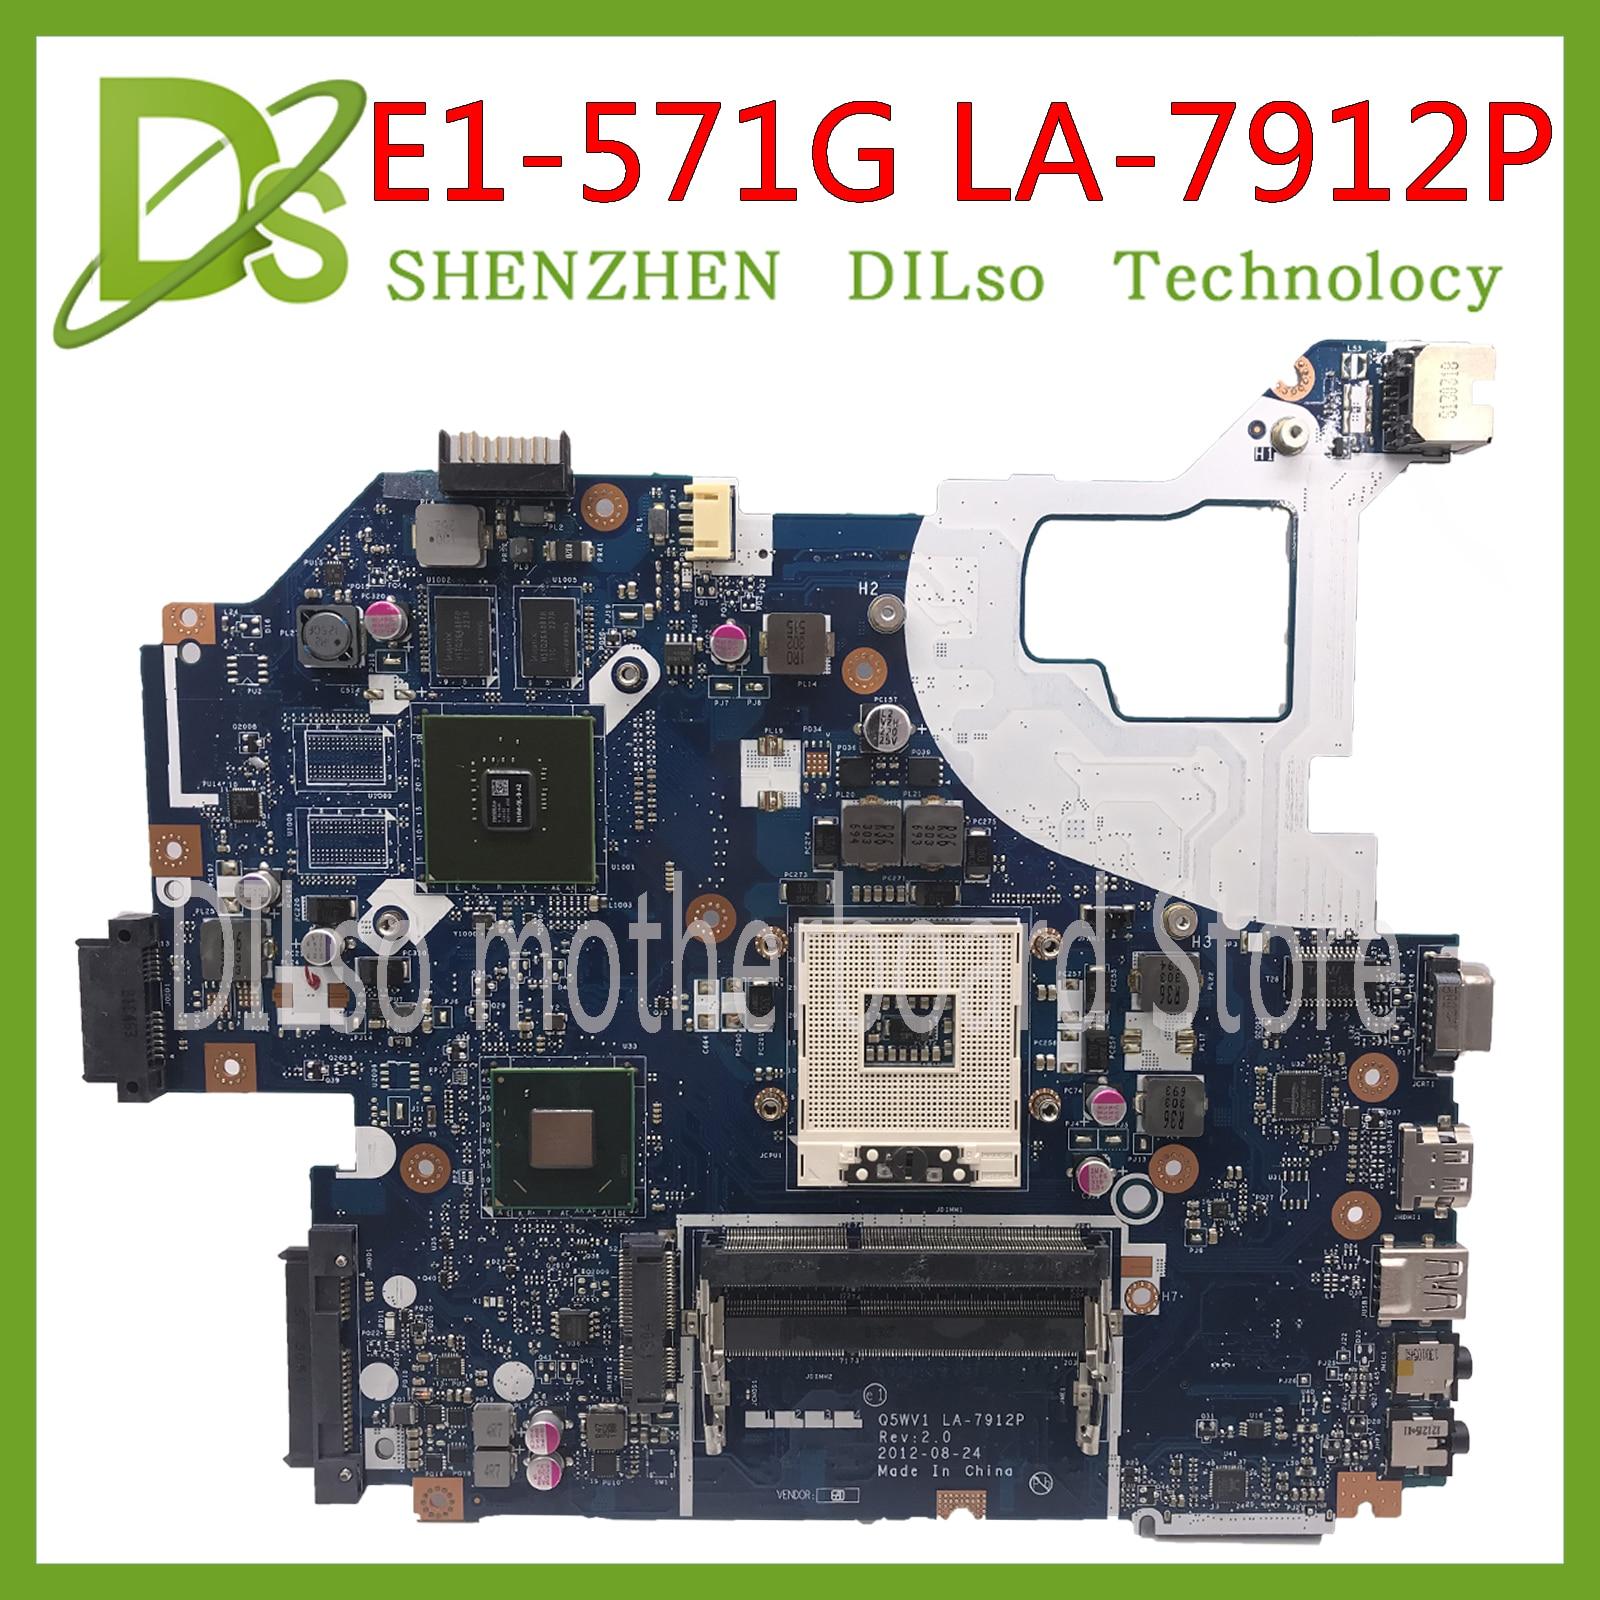 KEFU LA-7912P motherboard fit for ACER Aspire E1-571G E1-571 V3-571G V3-571 motherboard Q5WV1 LA-7912P  HM77 PGA989 TestKEFU LA-7912P motherboard fit for ACER Aspire E1-571G E1-571 V3-571G V3-571 motherboard Q5WV1 LA-7912P  HM77 PGA989 Test